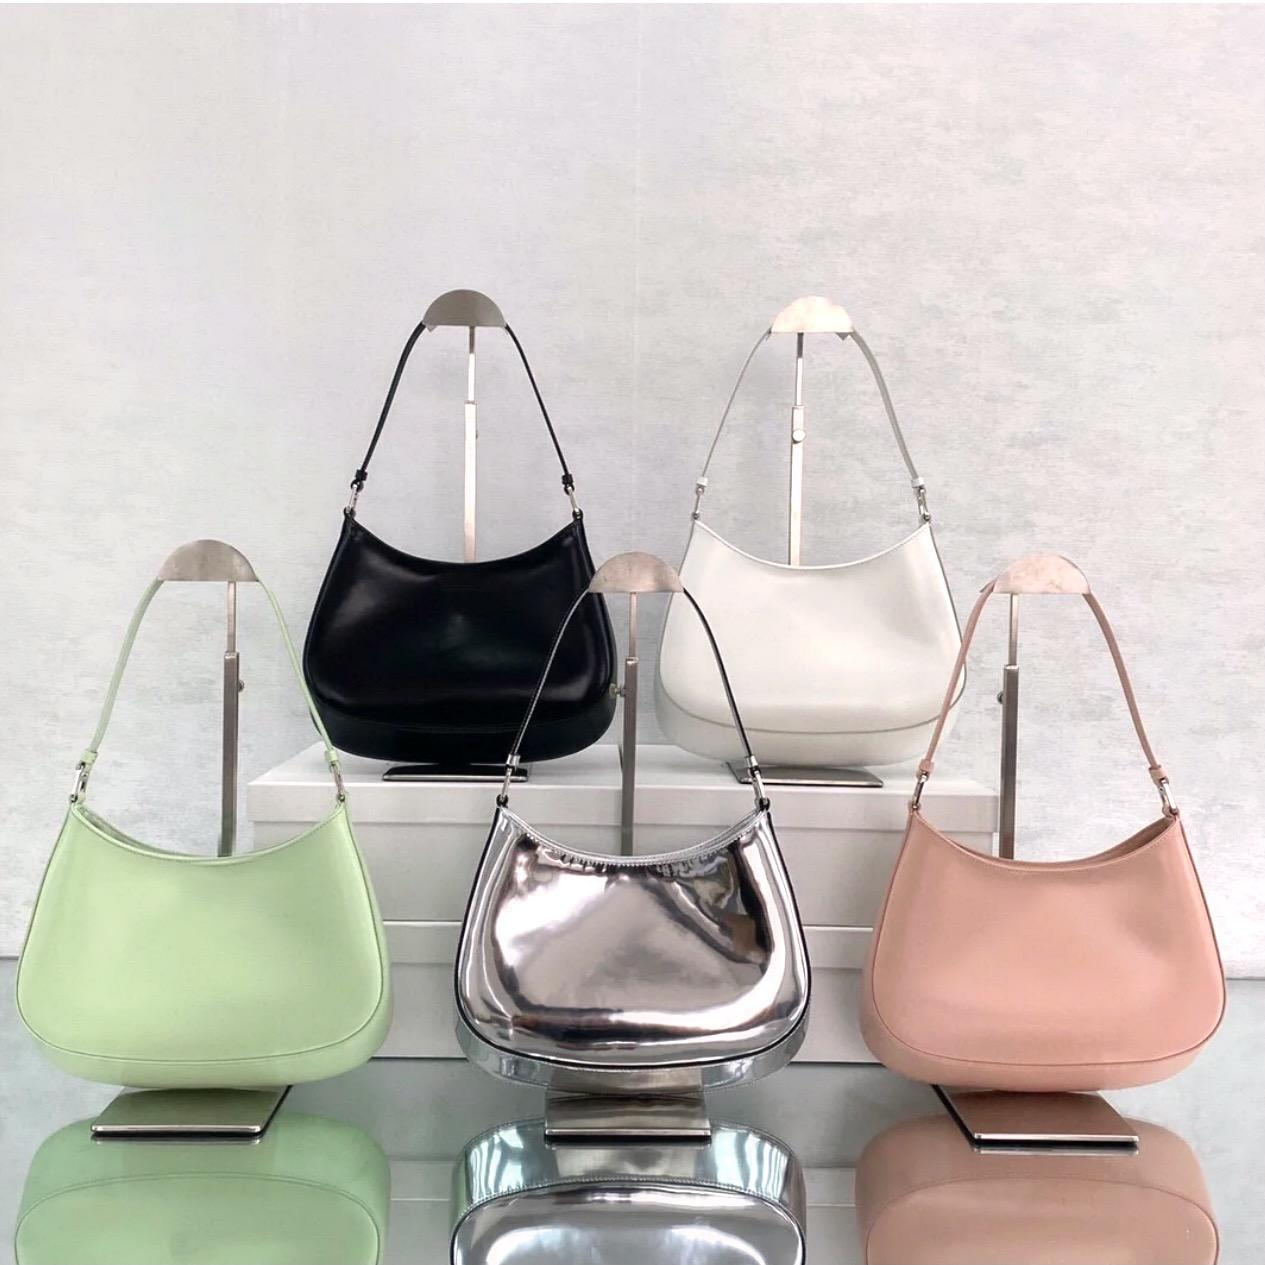 Classic Leather handbags hobo crossbody bag shoulder bags for women fashion bags lady chains handbags cowhide hobo chain purse messenger bag